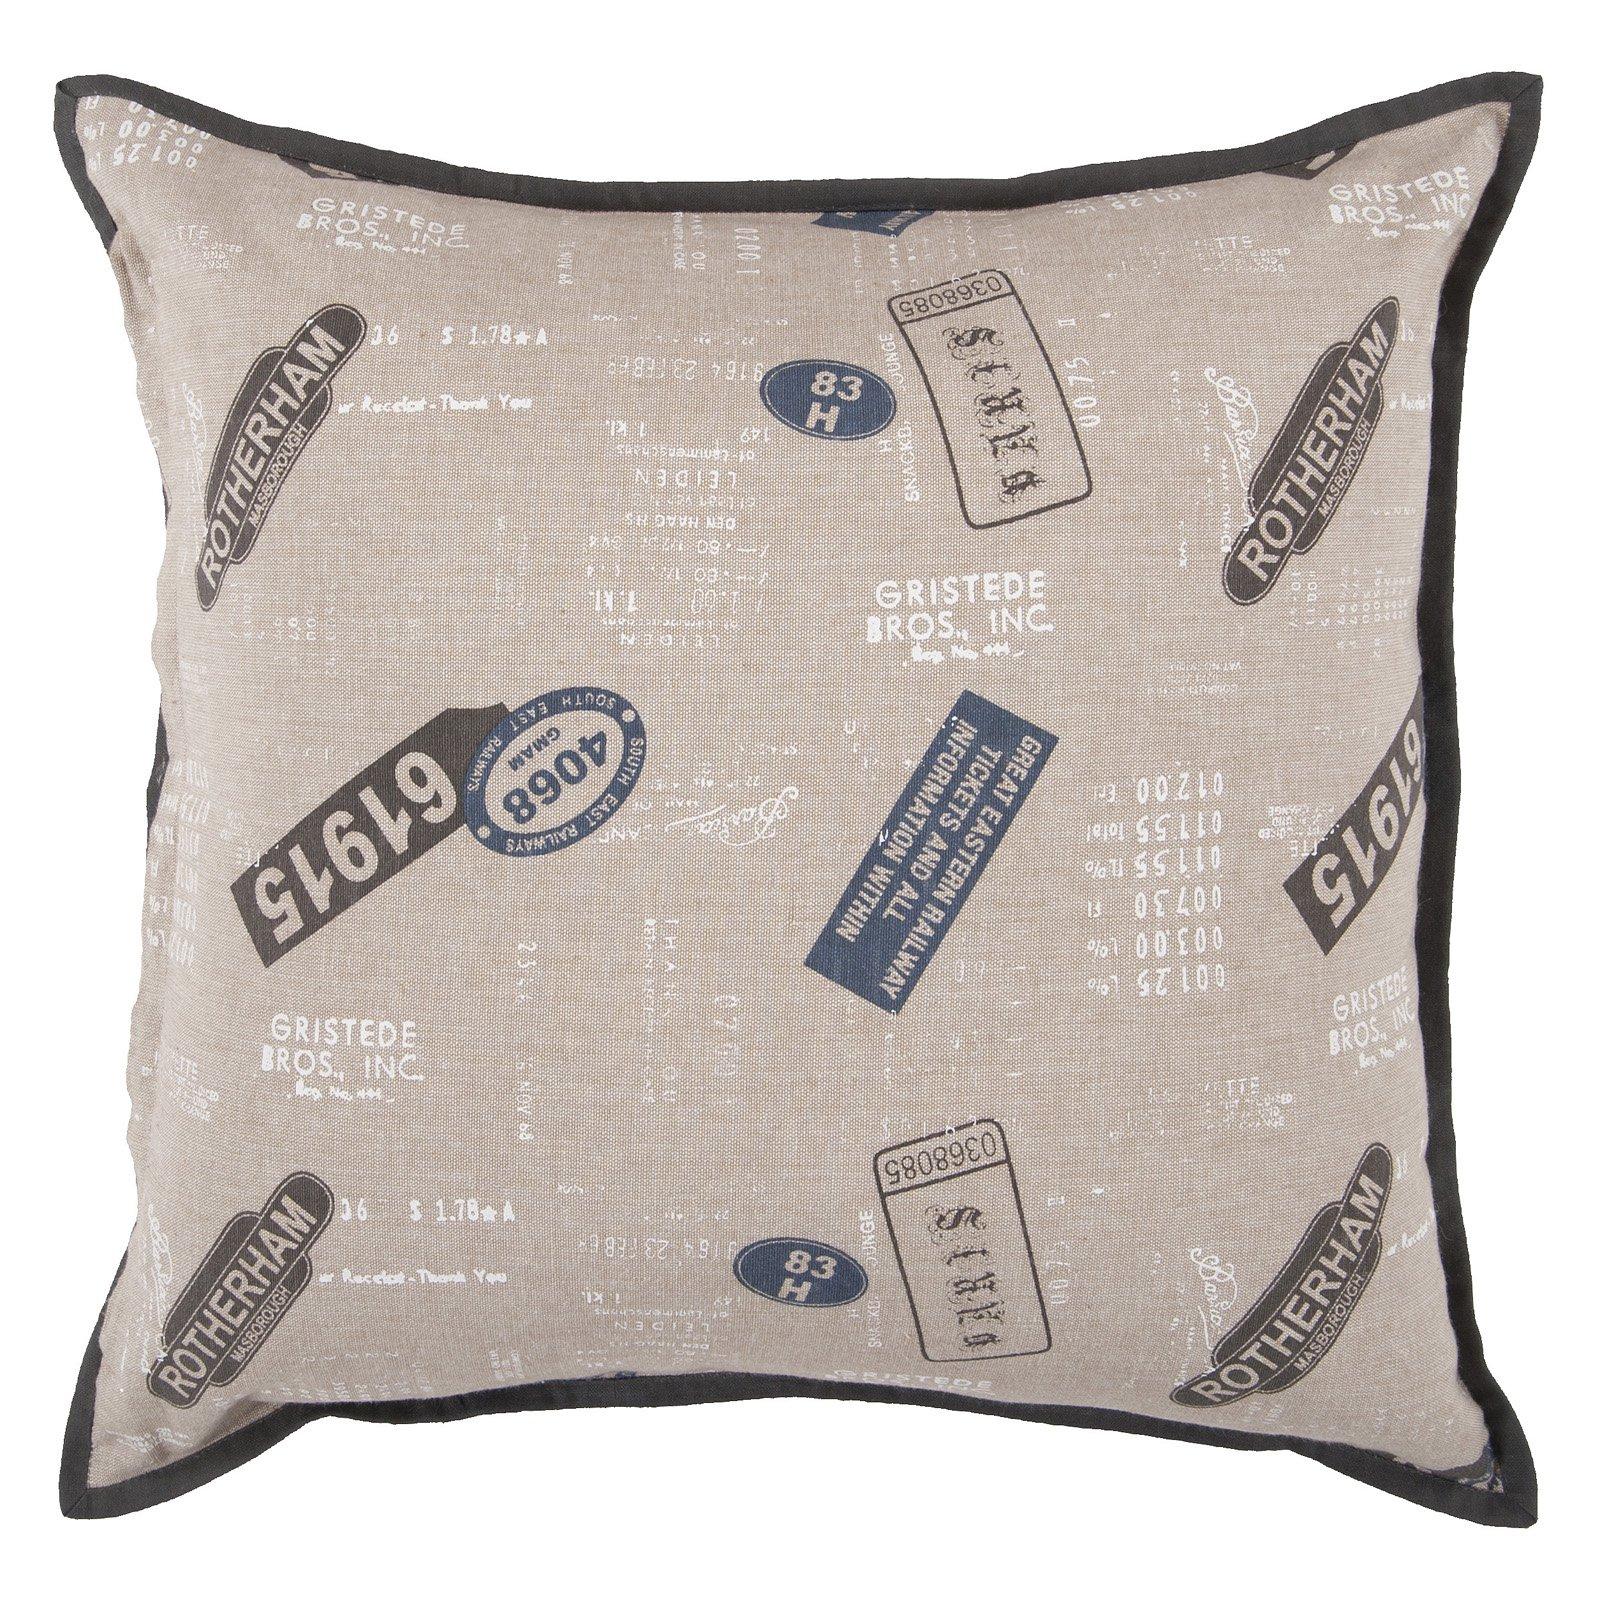 Surya Postal Decorative Pillow - Feather Gray